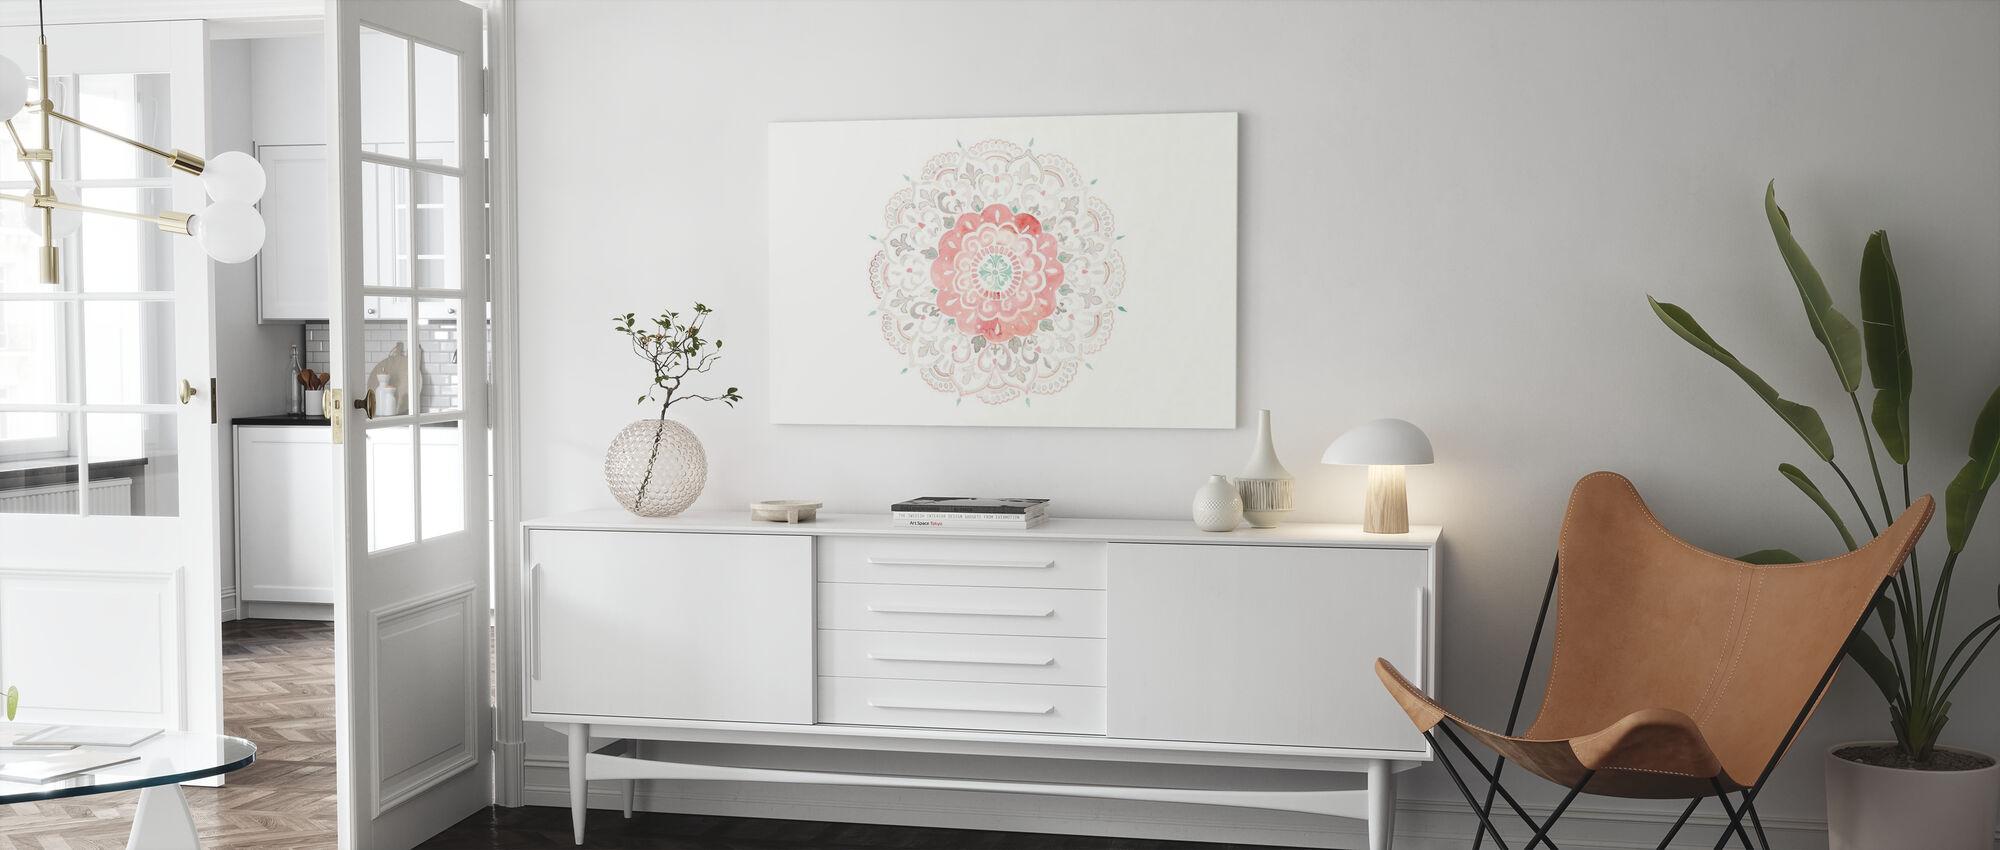 Mandala Delight IIII - Leinwandbild - Wohnzimmer